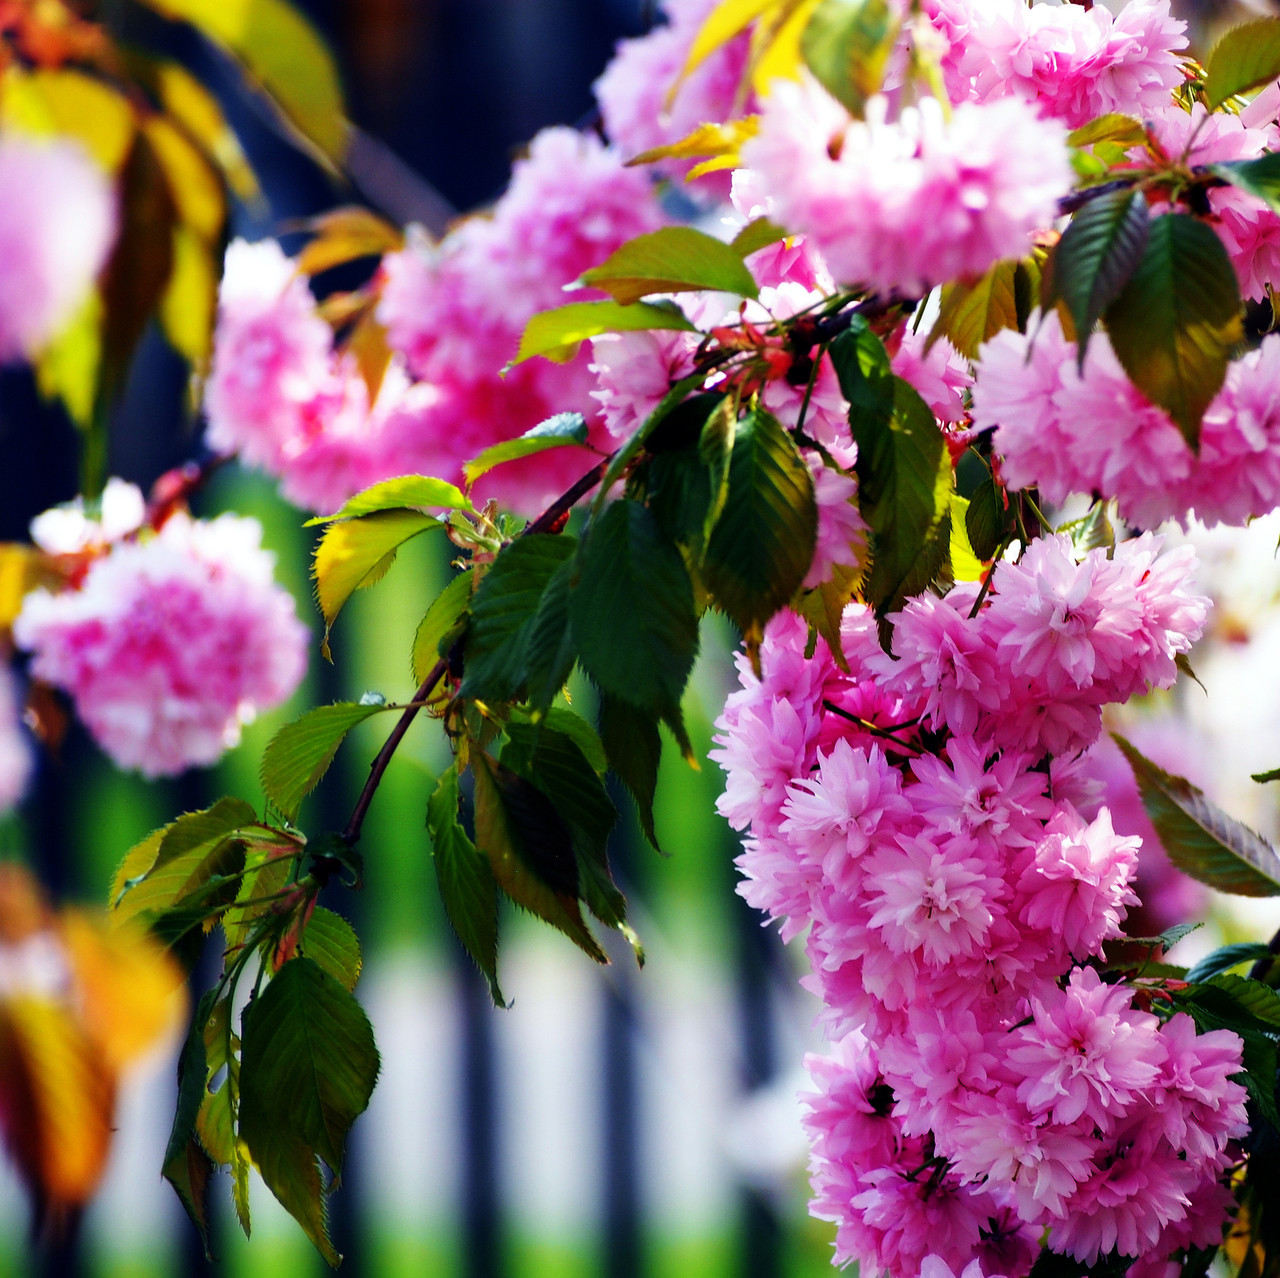 Cheals Weeping Pink Flowering Cherry Tree 5 6ft Prrulata Kiku